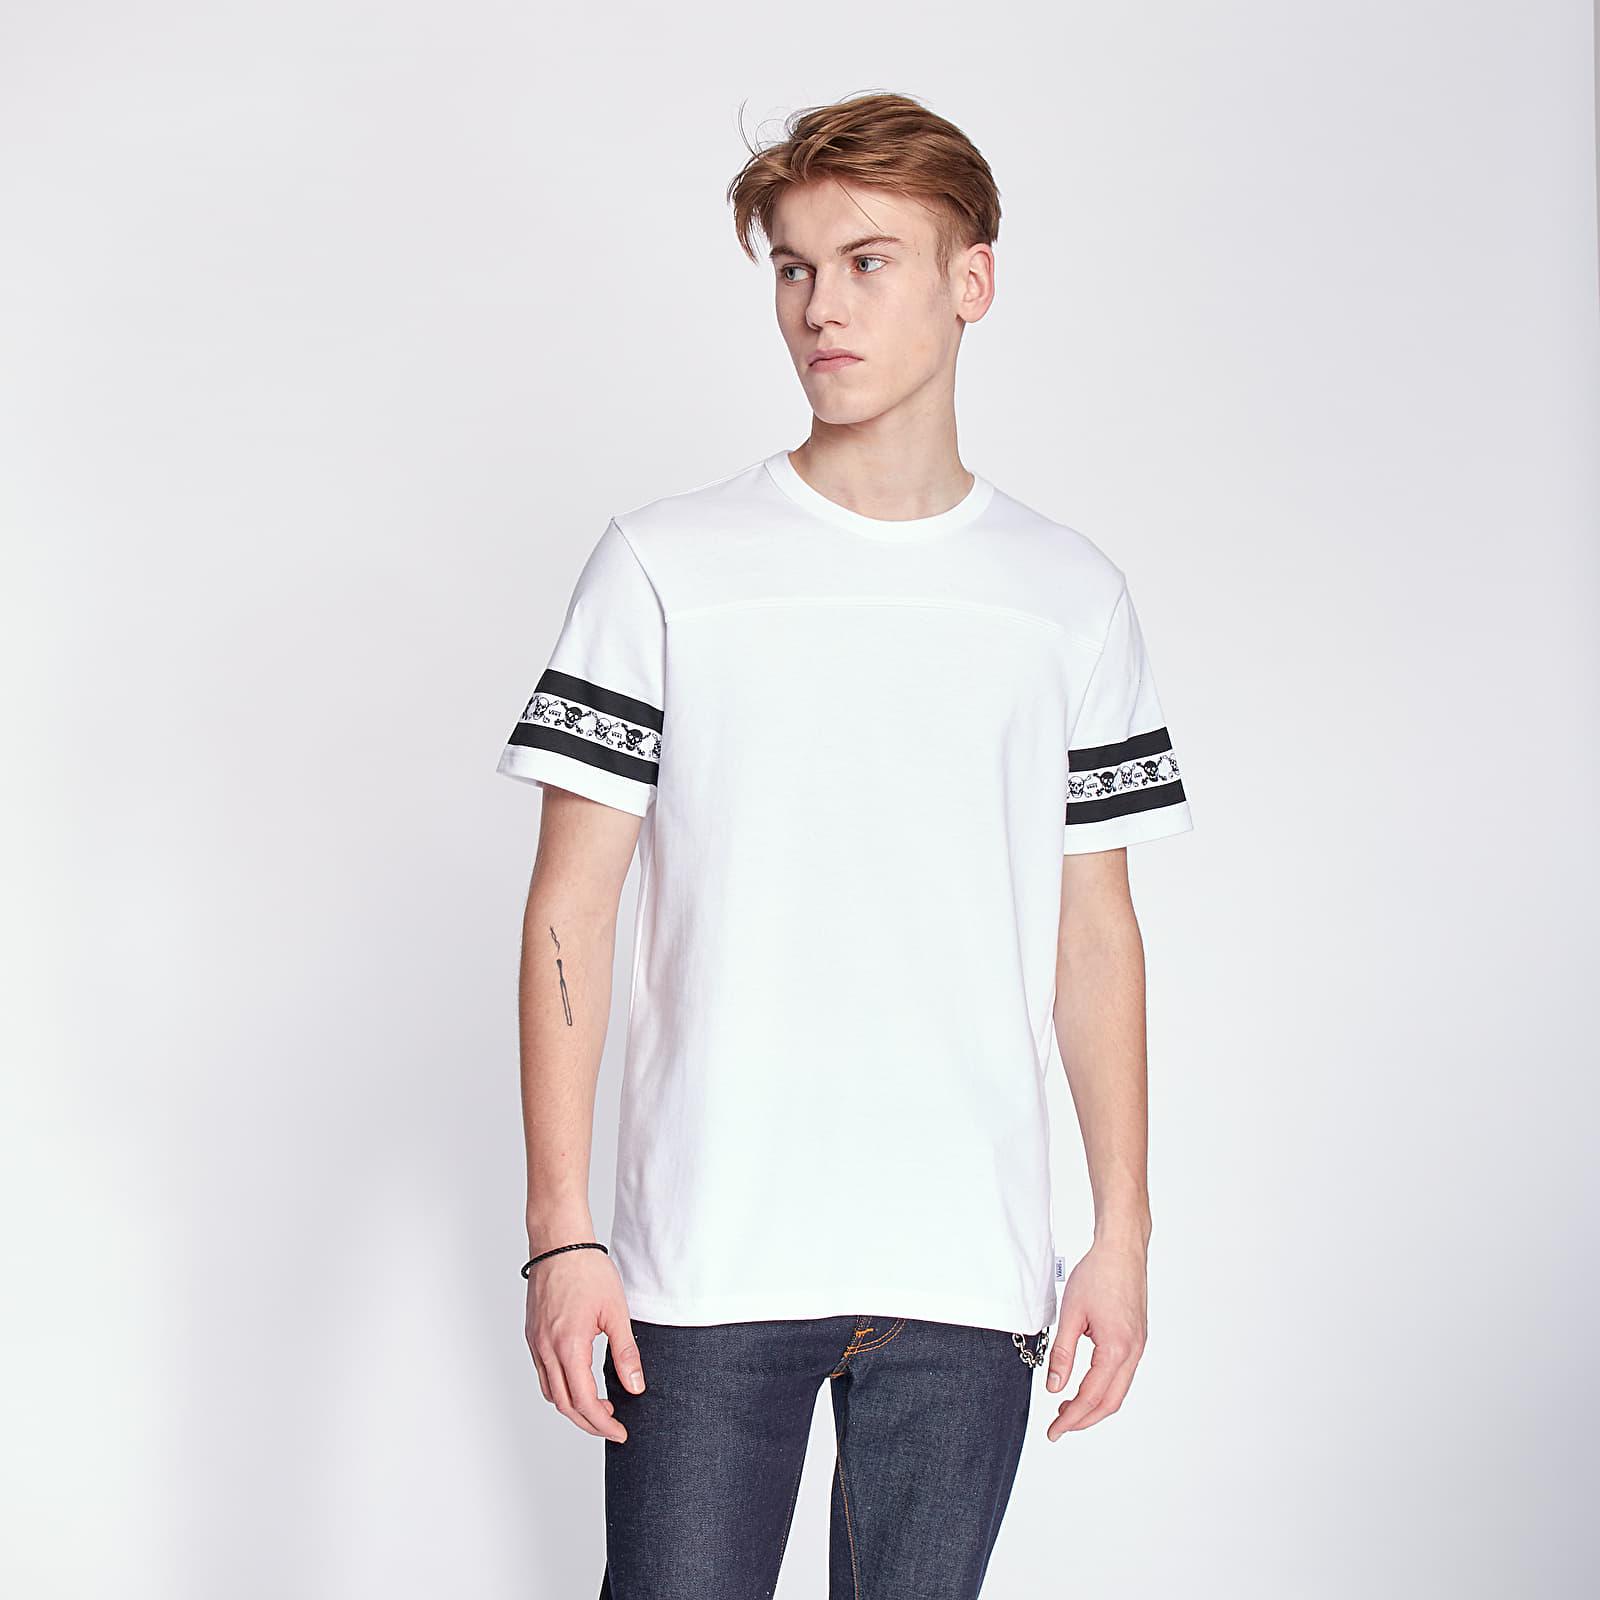 T-shirts Vans Anaheim Factory Tee White